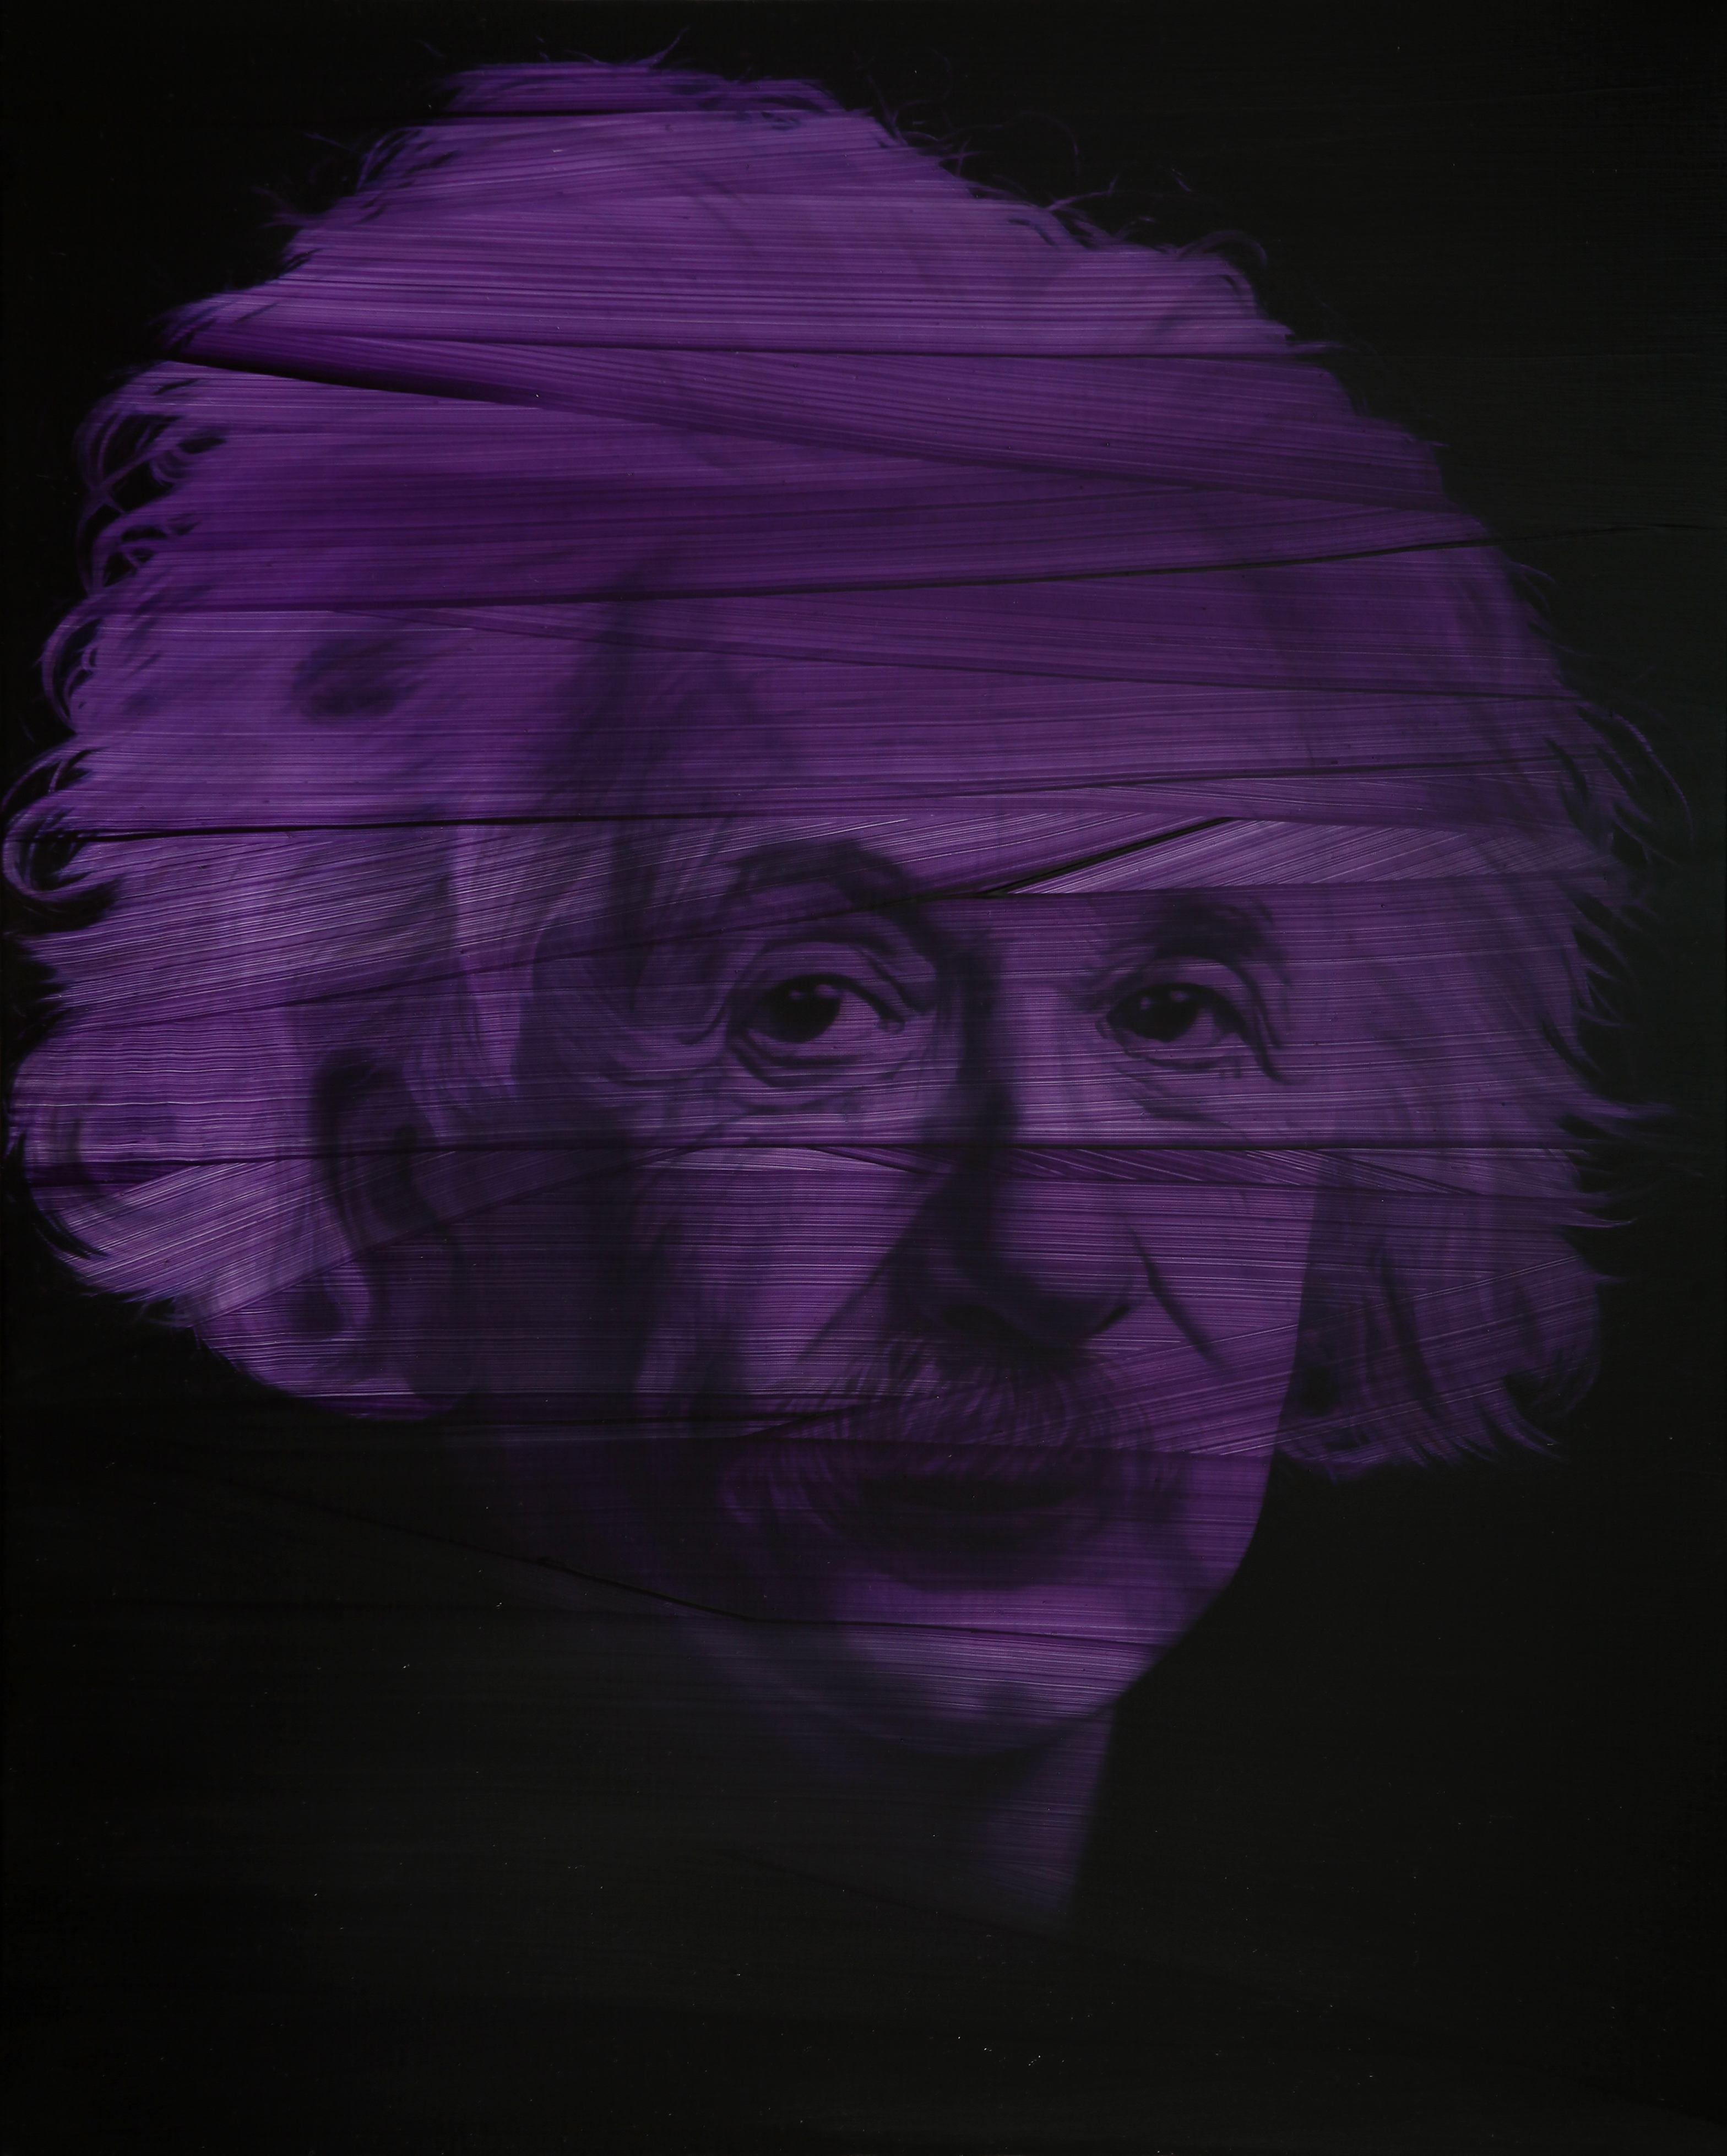 刹那無常 - Albert Einstein